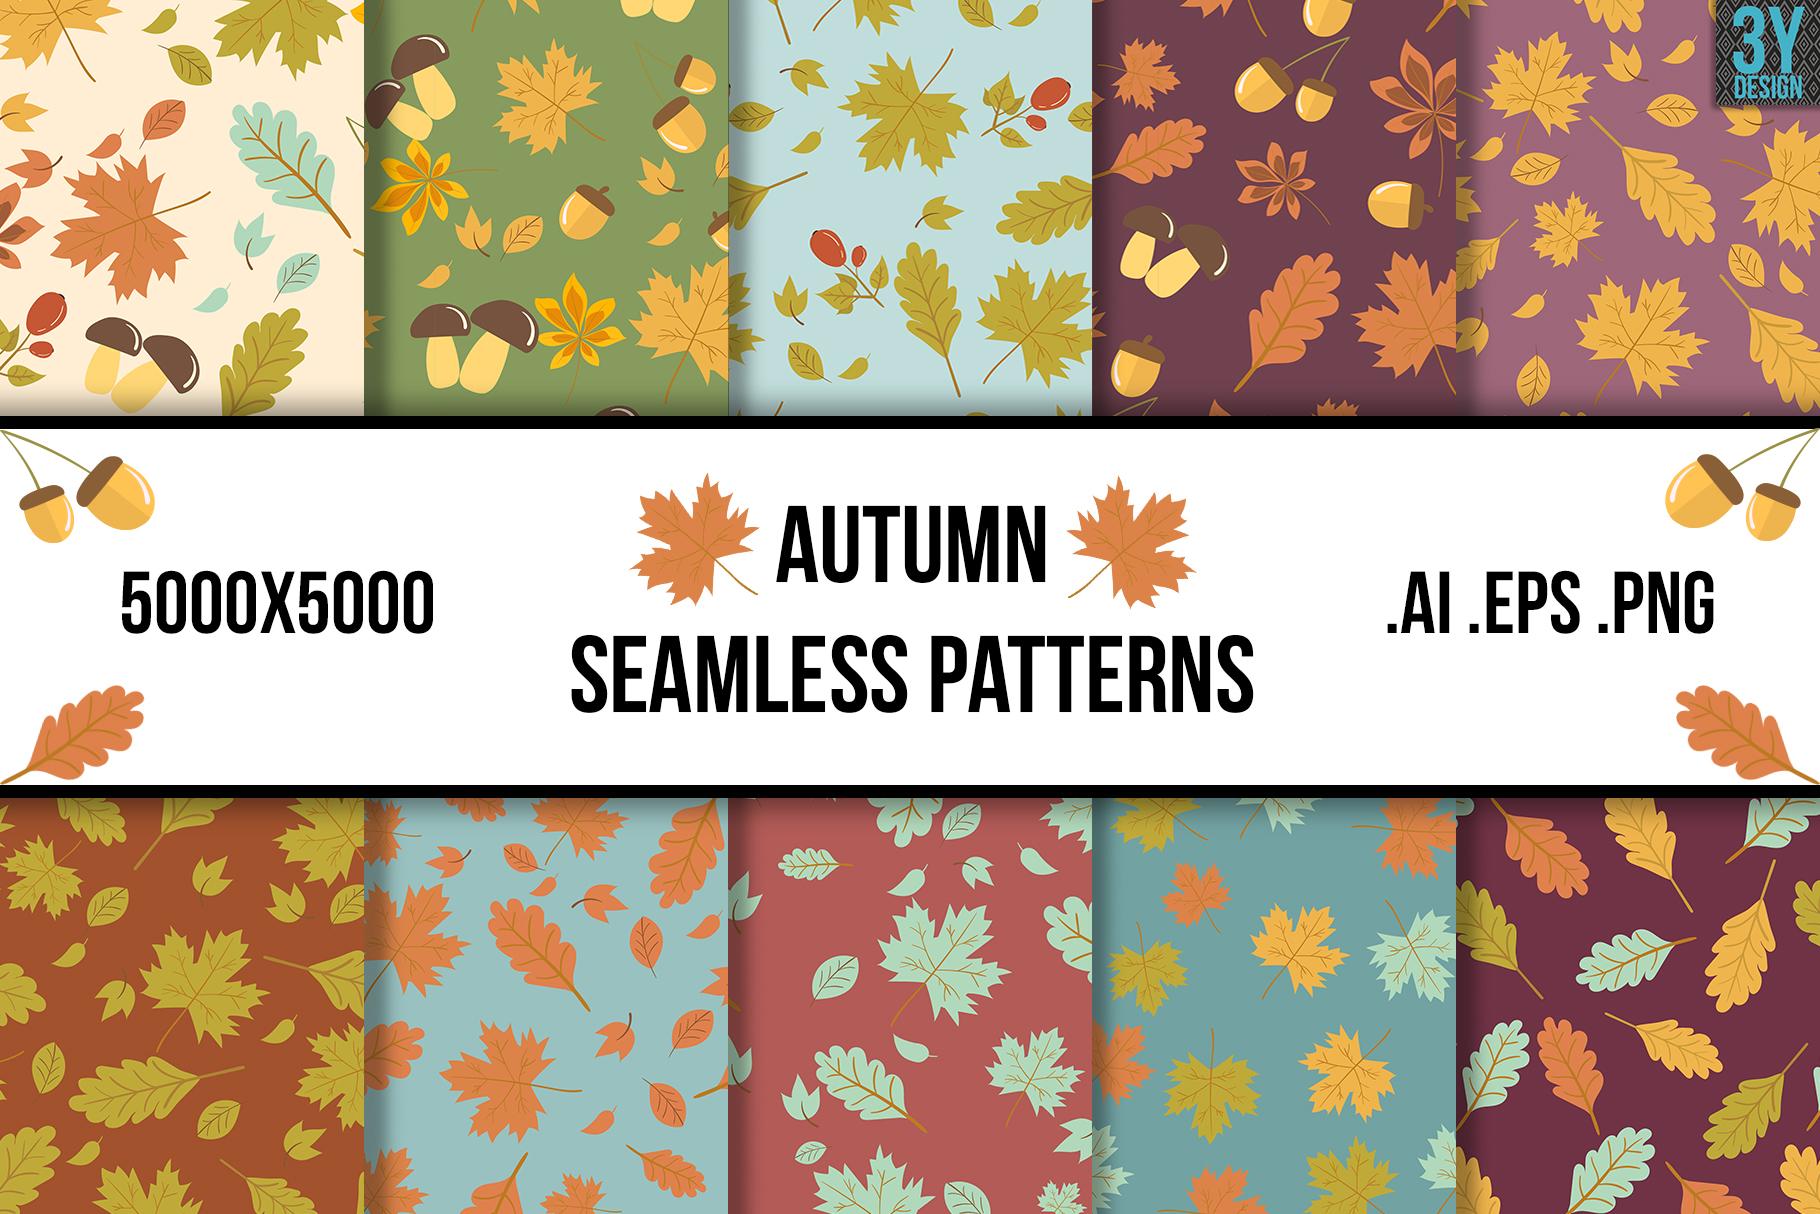 Autumn Seamless Patterns example image 1